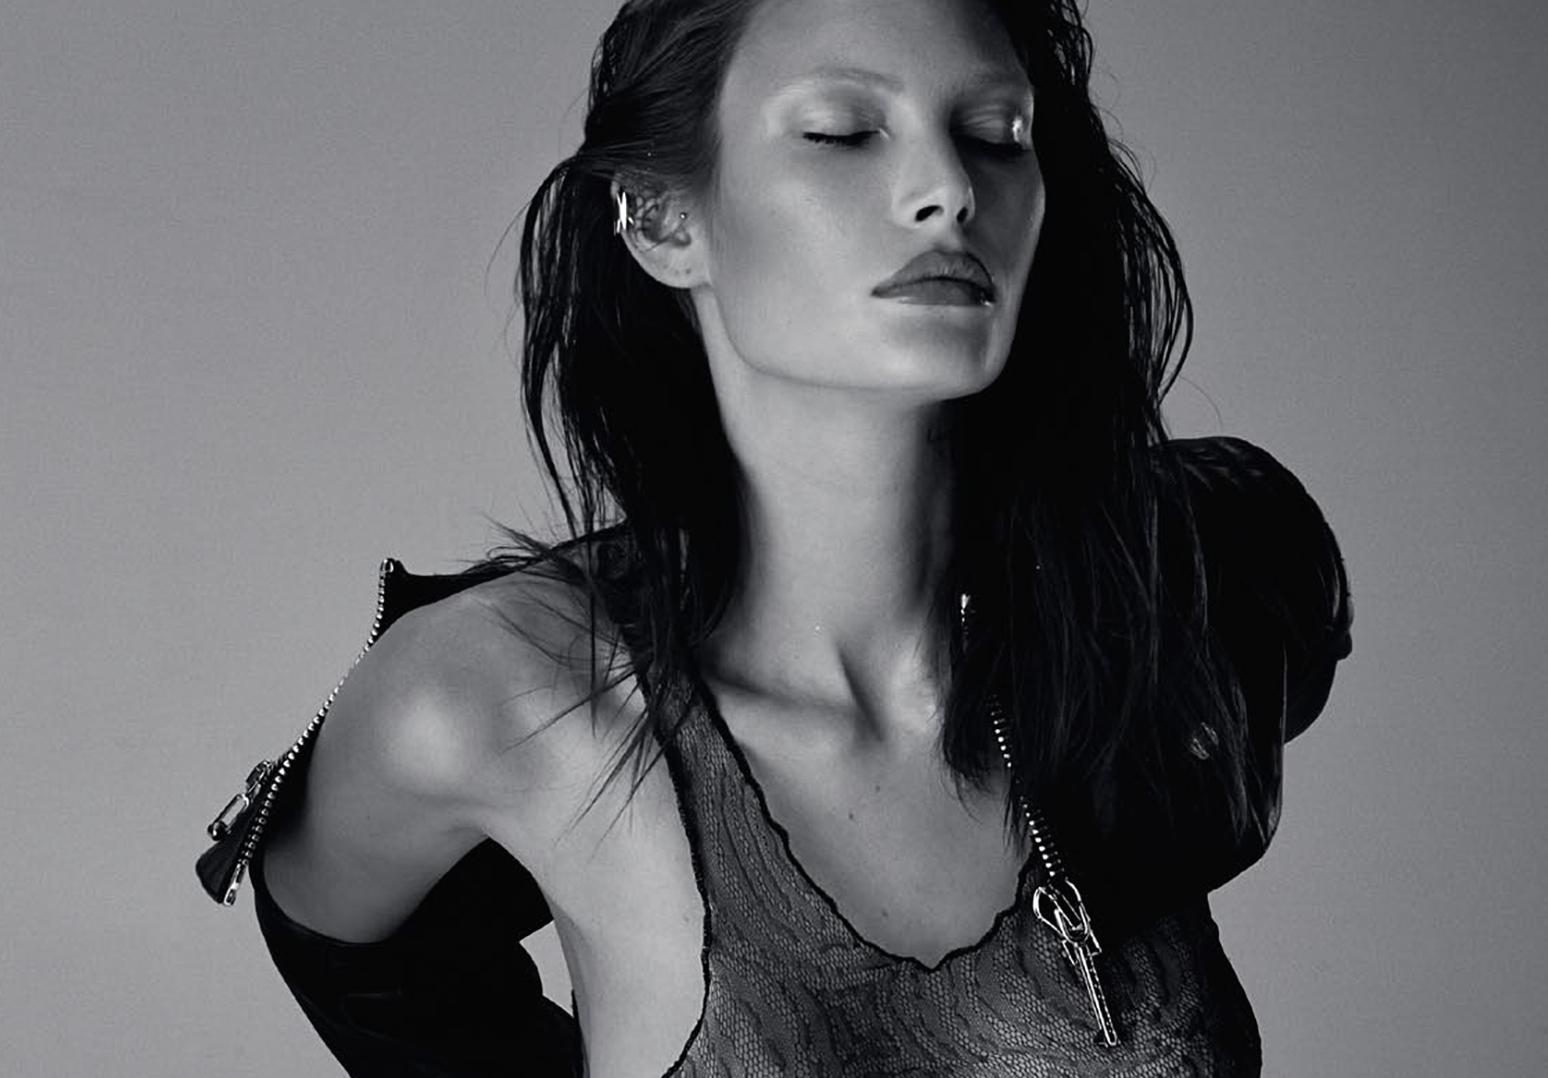 Bikini Ana Polvorosa nude (68 images), Boobs